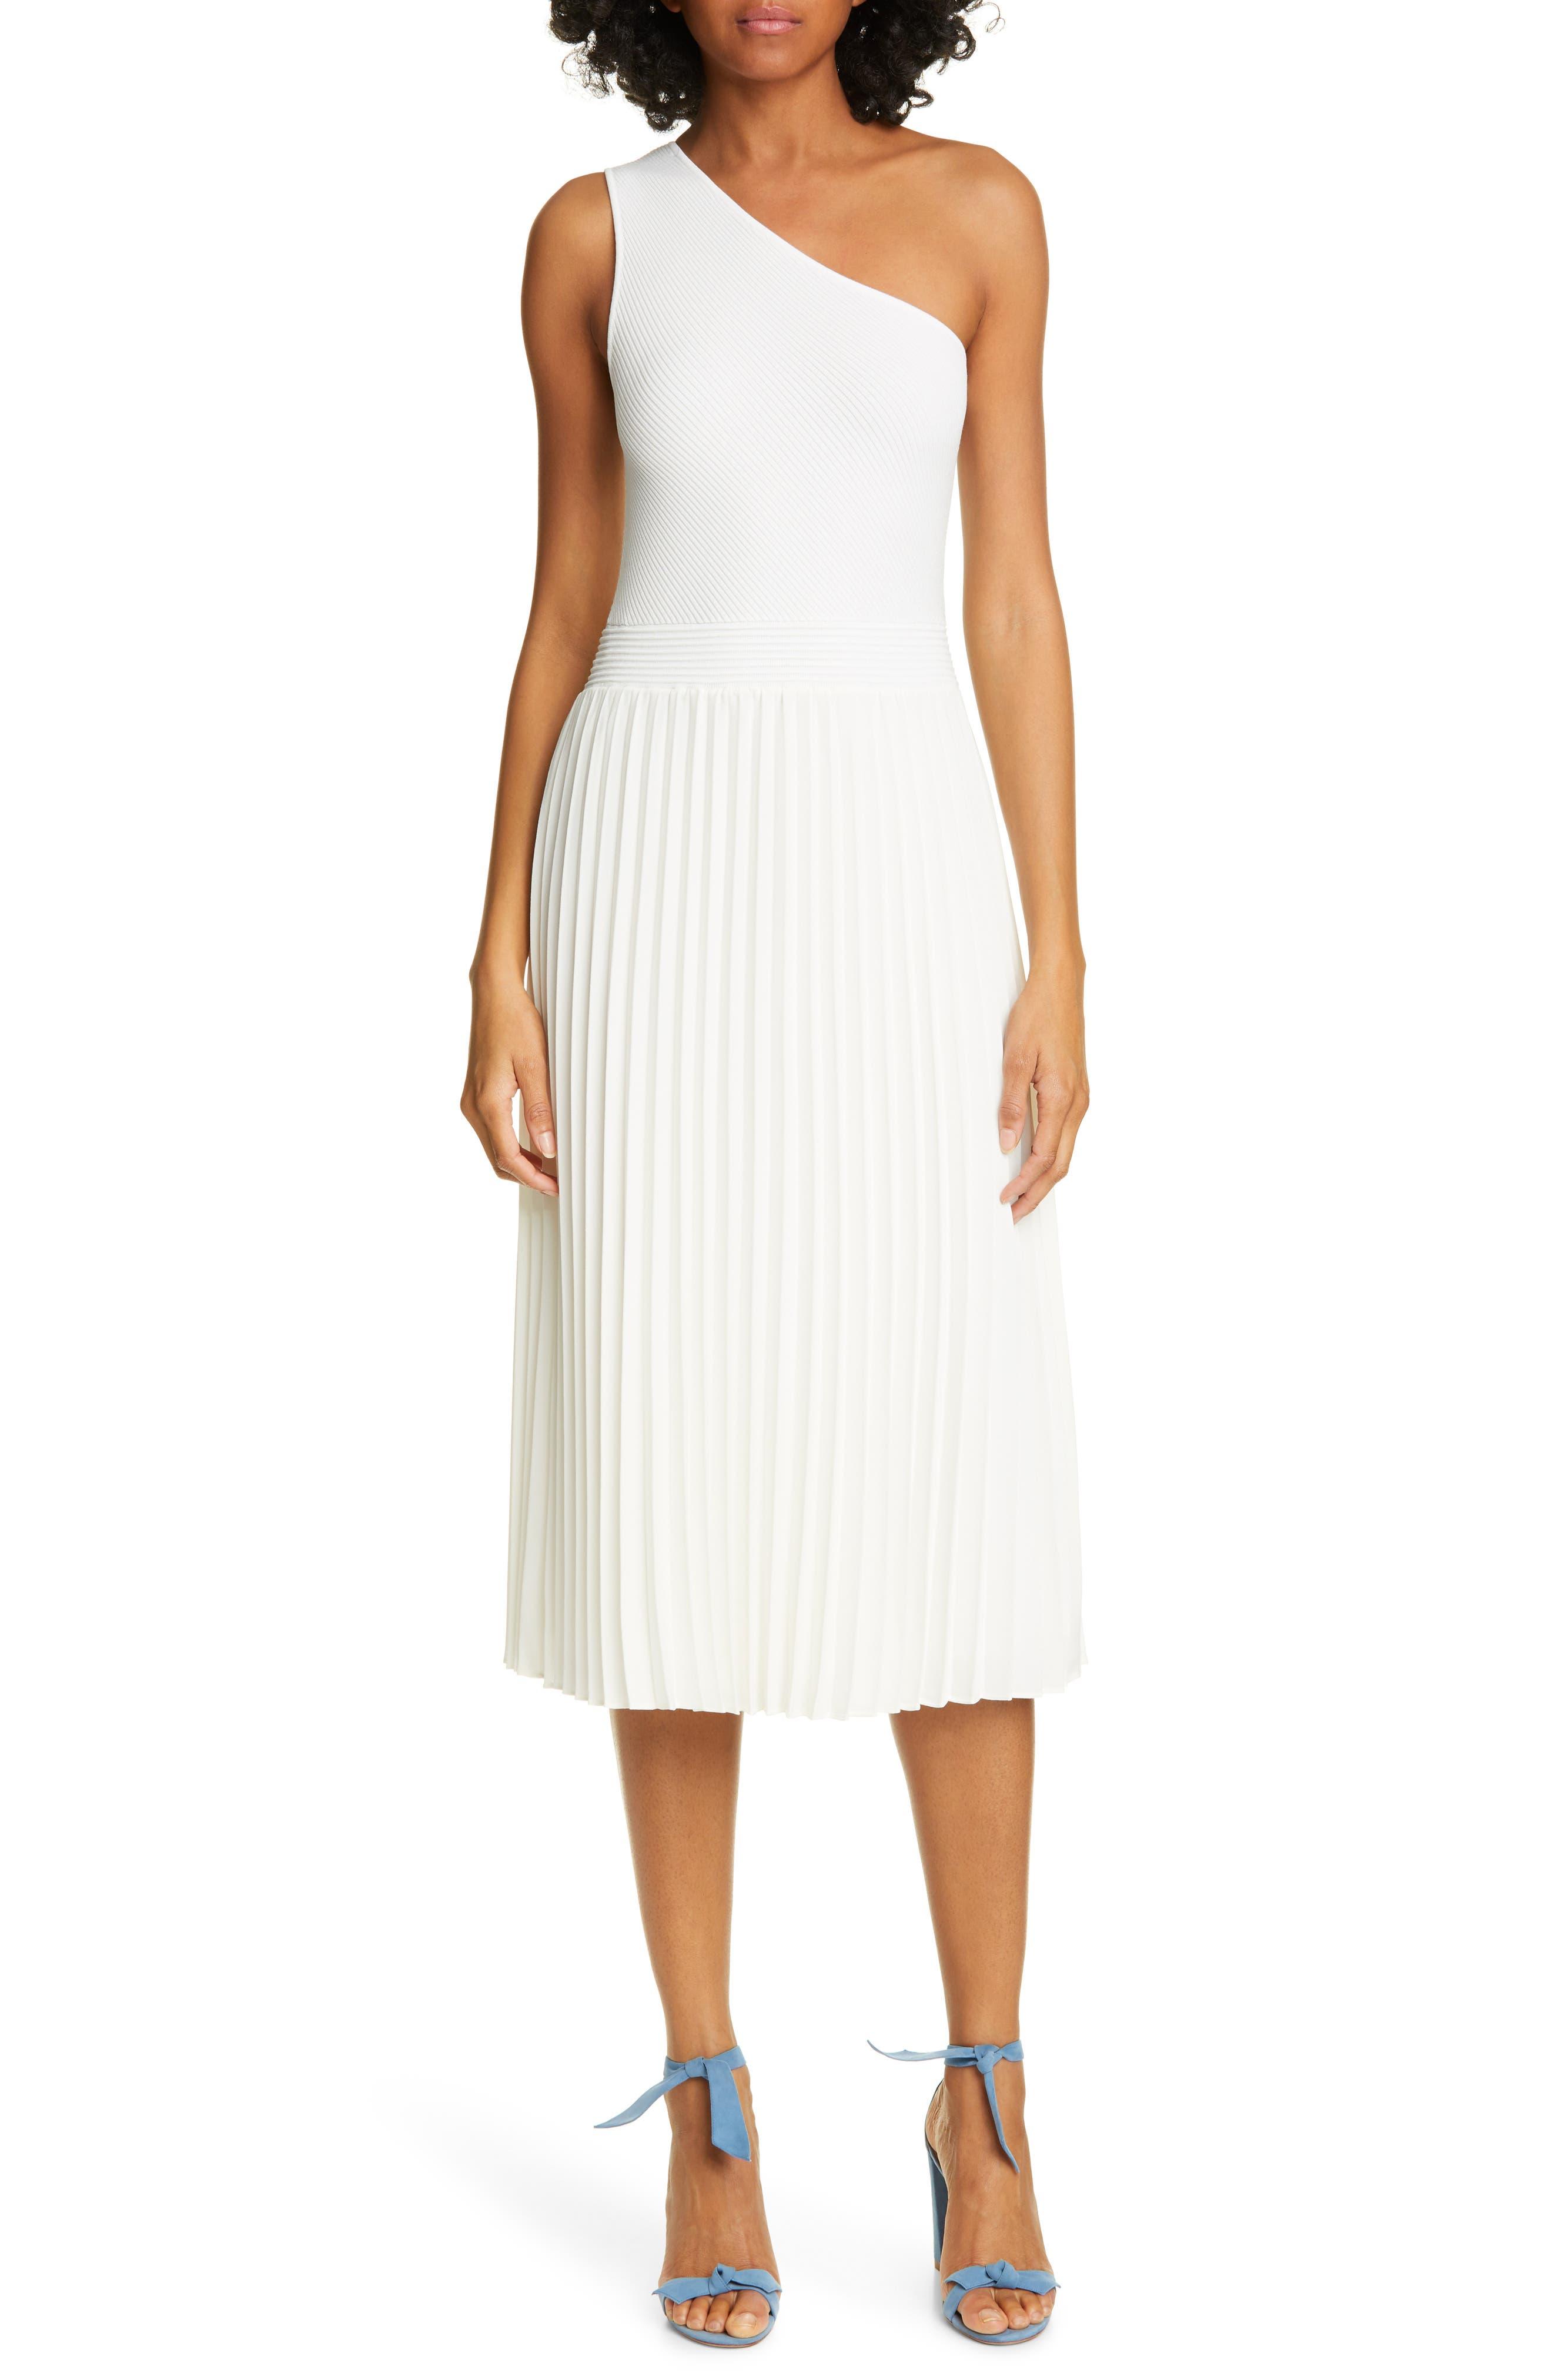 Ted Baker London Miriom Mixed Media One-Shoulder Dress, White